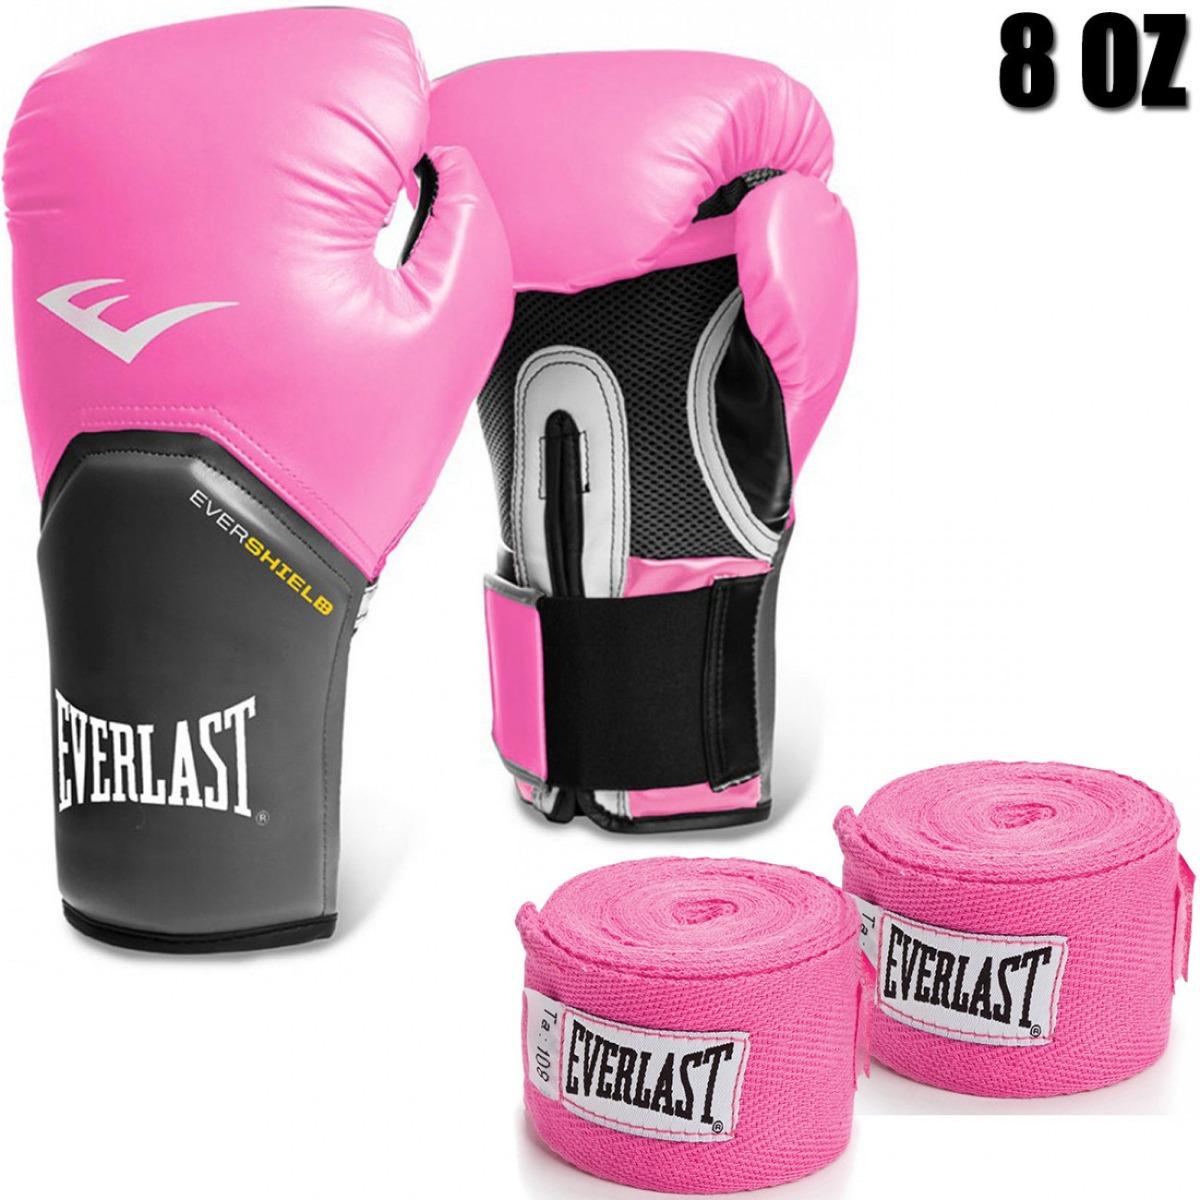 94640219a luva boxe everlast pro style elite 8 oz + 2 bandagens rosa. Carregando zoom.